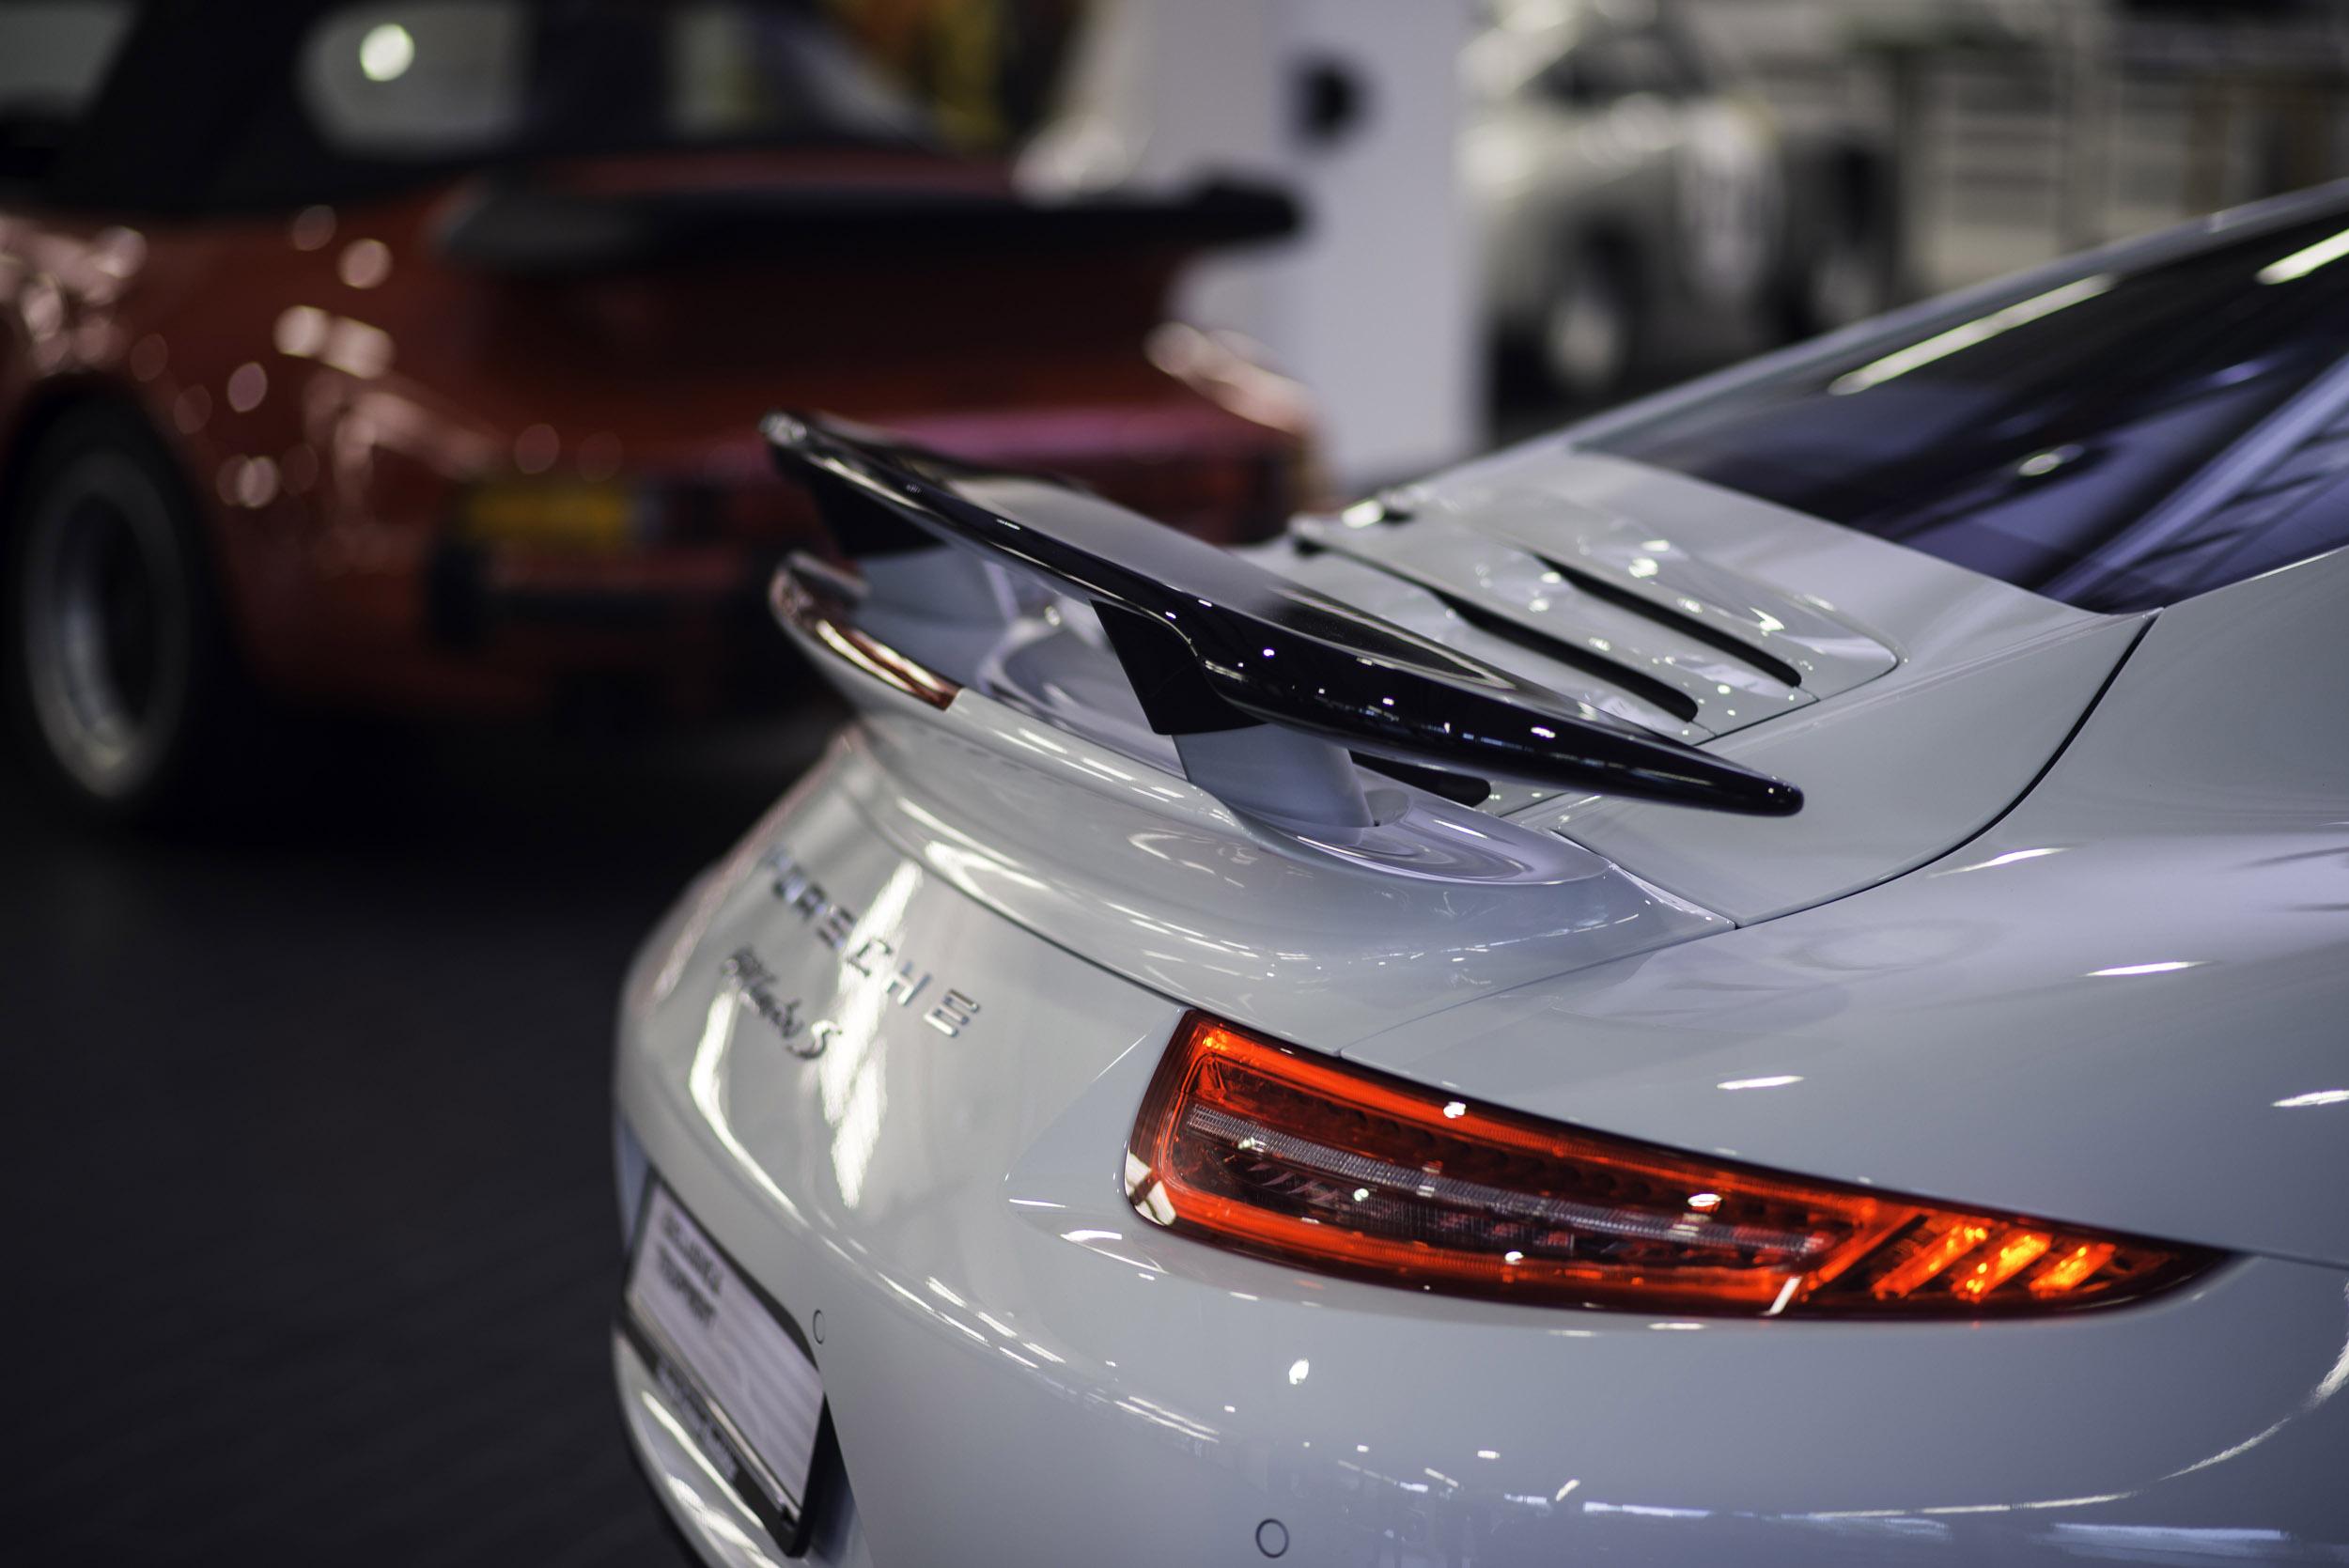 2014 Porsche 911 Turbo S Exclusive Gb Edition Price 163 150 237